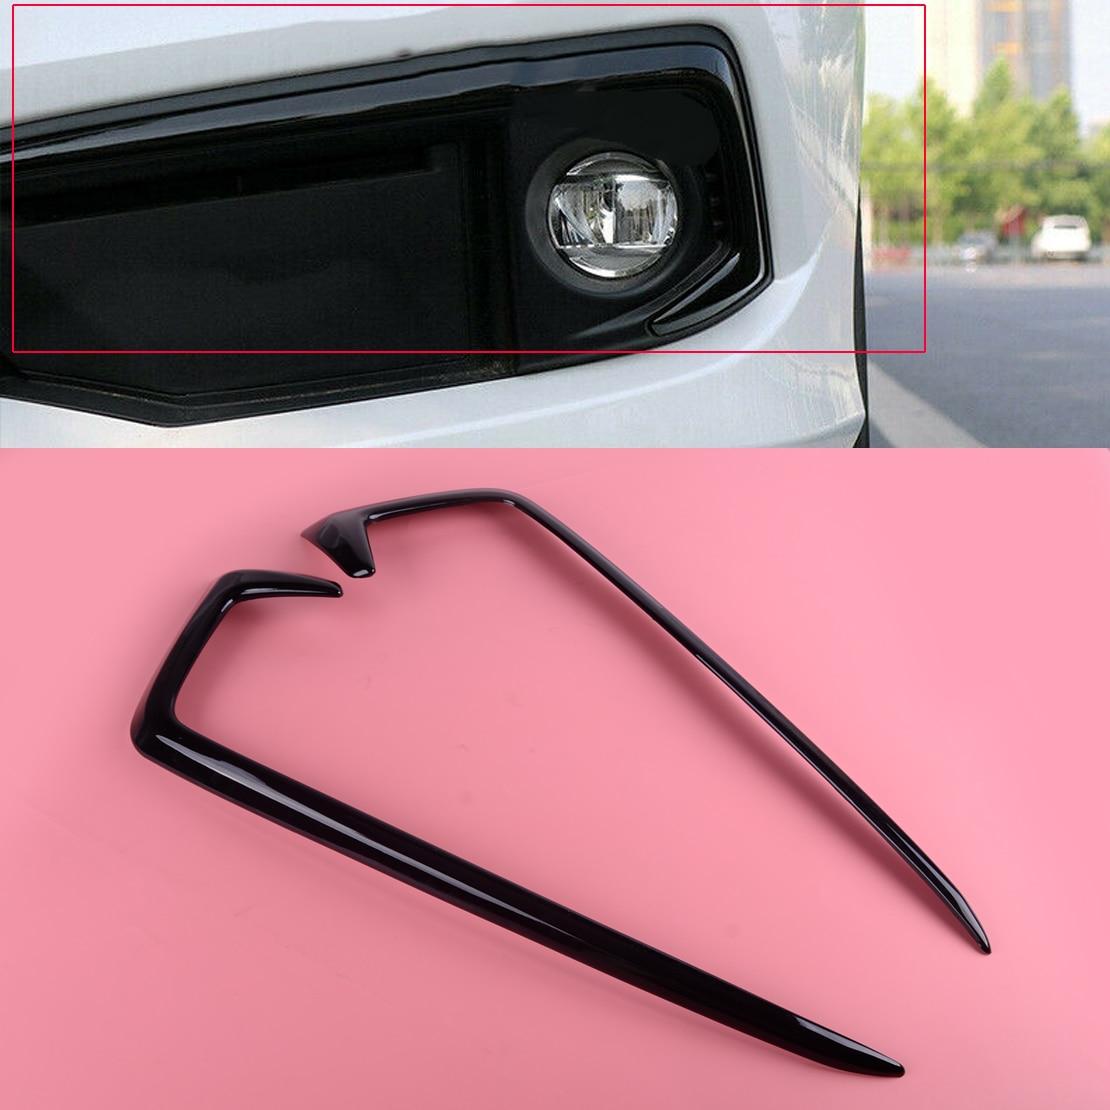 DWCX 2PCS 3D Sticker ABS Gloss Black Front Fog Light Lamp Hood Eyebrow Cover Trim Fit For Honda Civic 2019 2020|Car Stickers| |  -